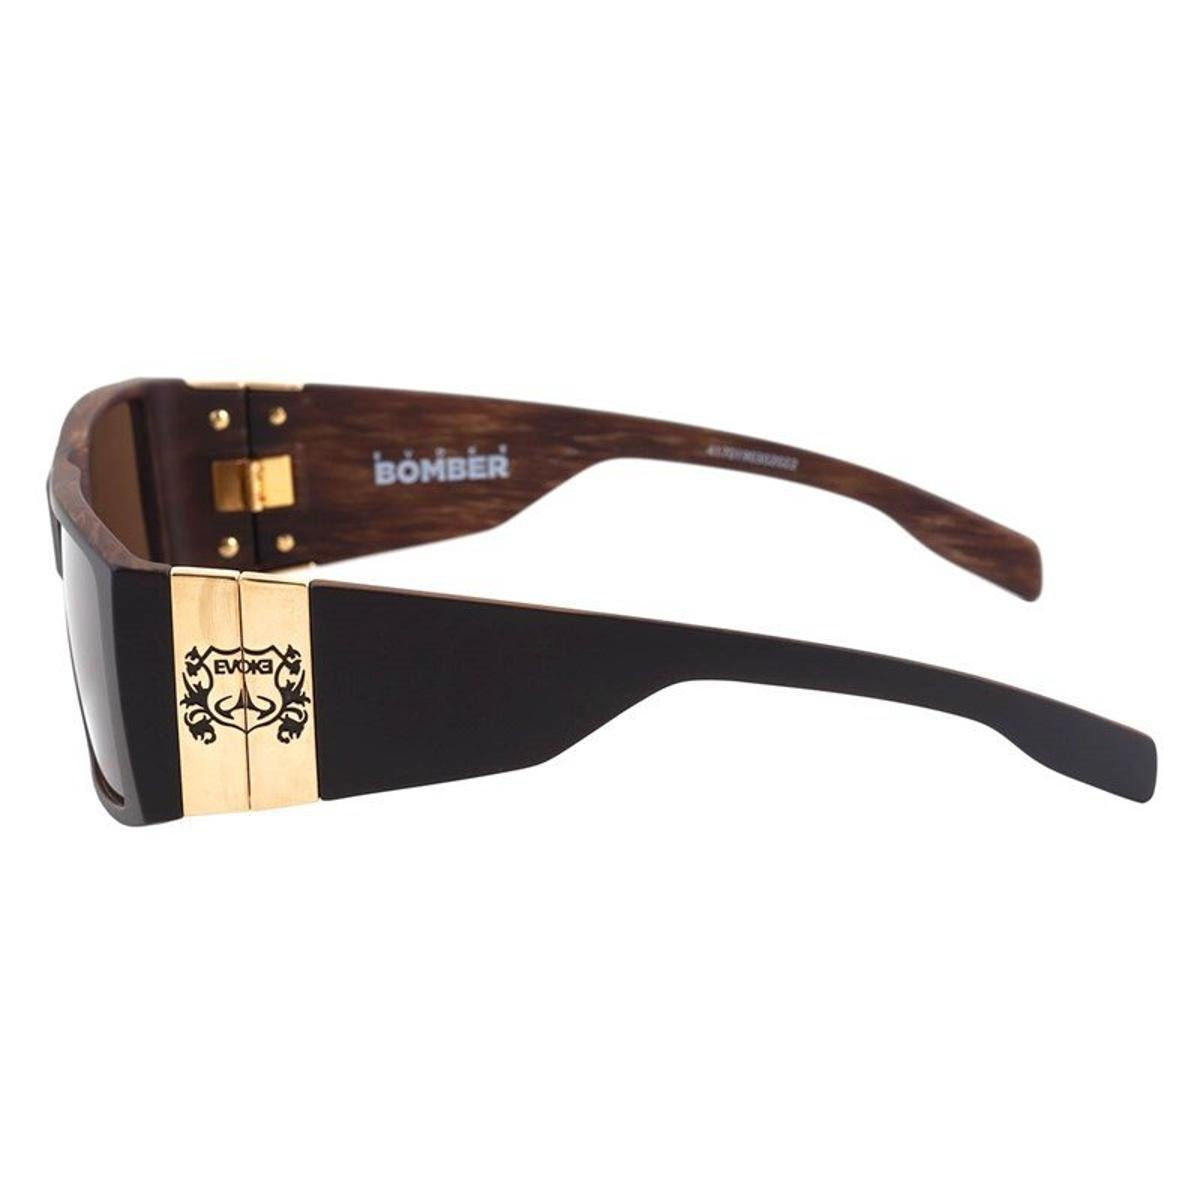 767db9510a457 Óculos Evoke Bomber Black Wood Matte Black - Compre Agora   Zattini